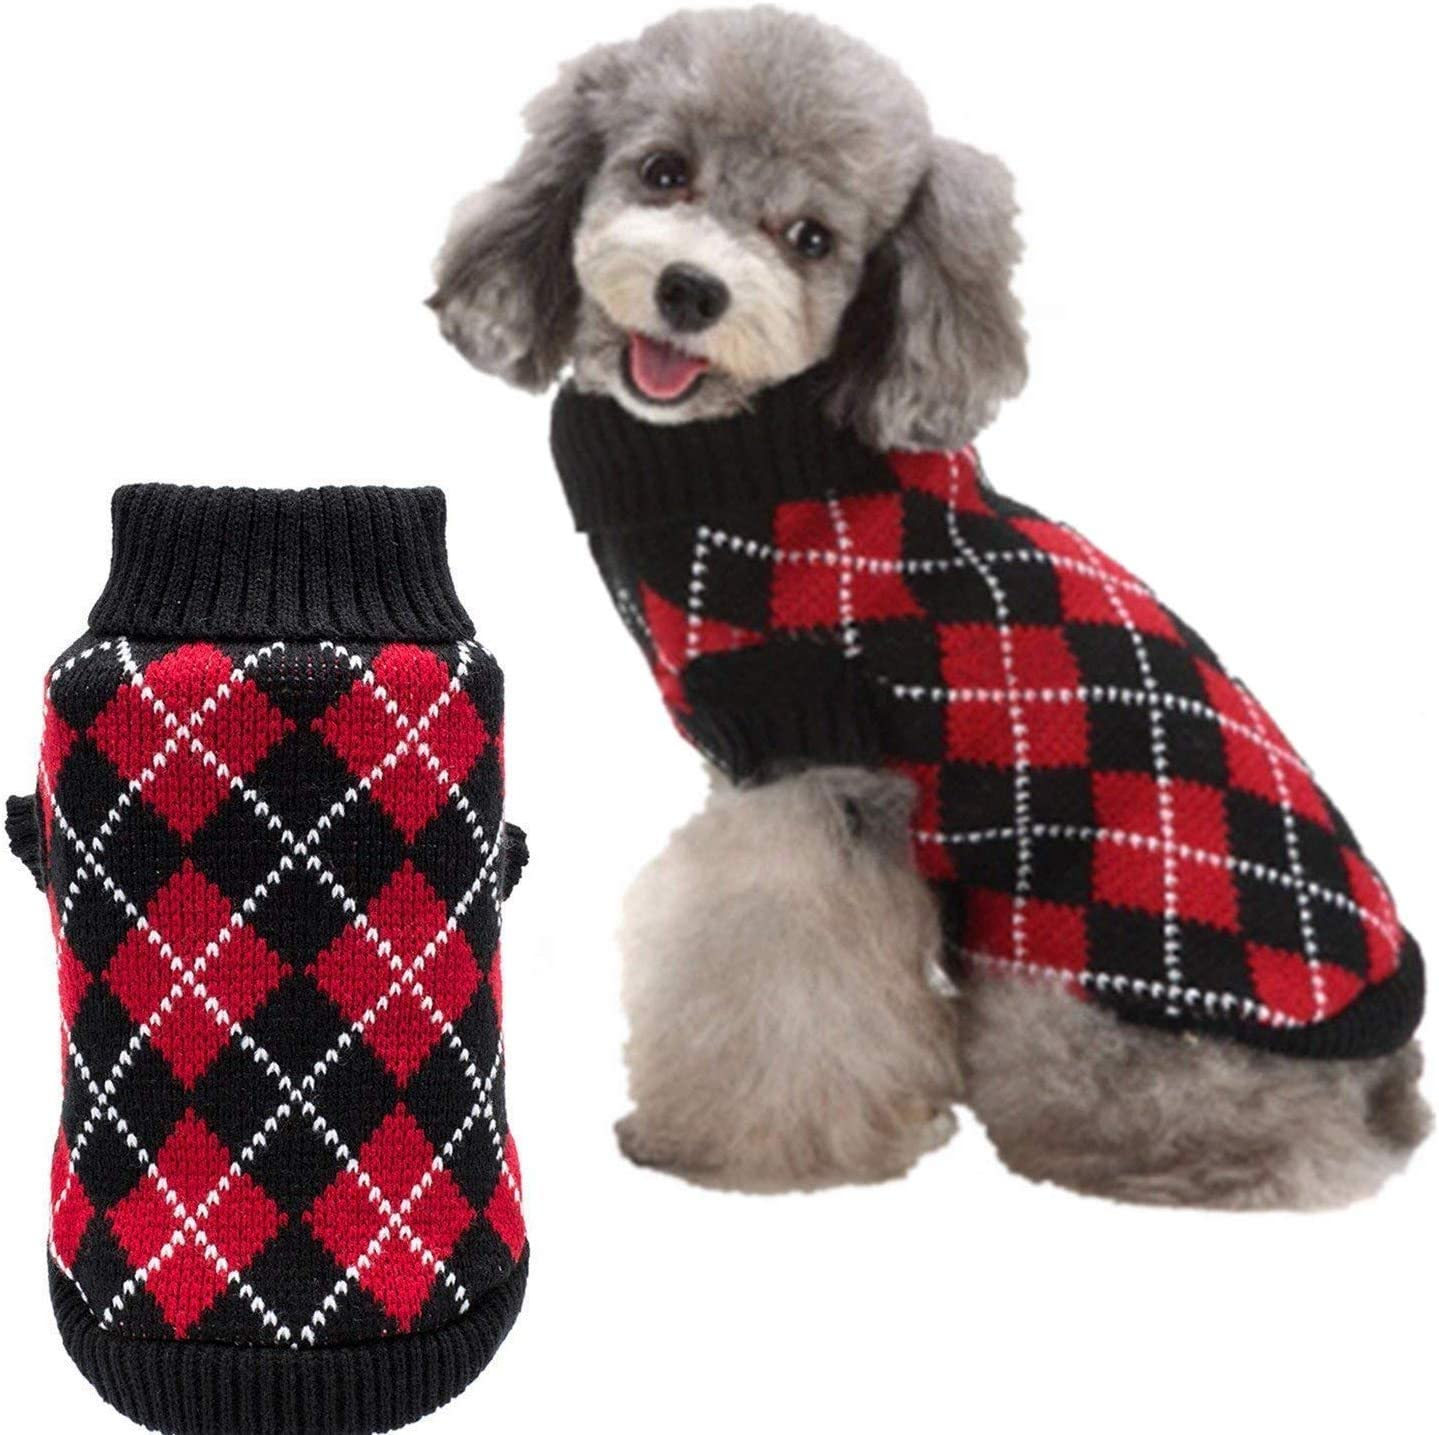 HOMIMP Hundepullover mit Argyle-Muster